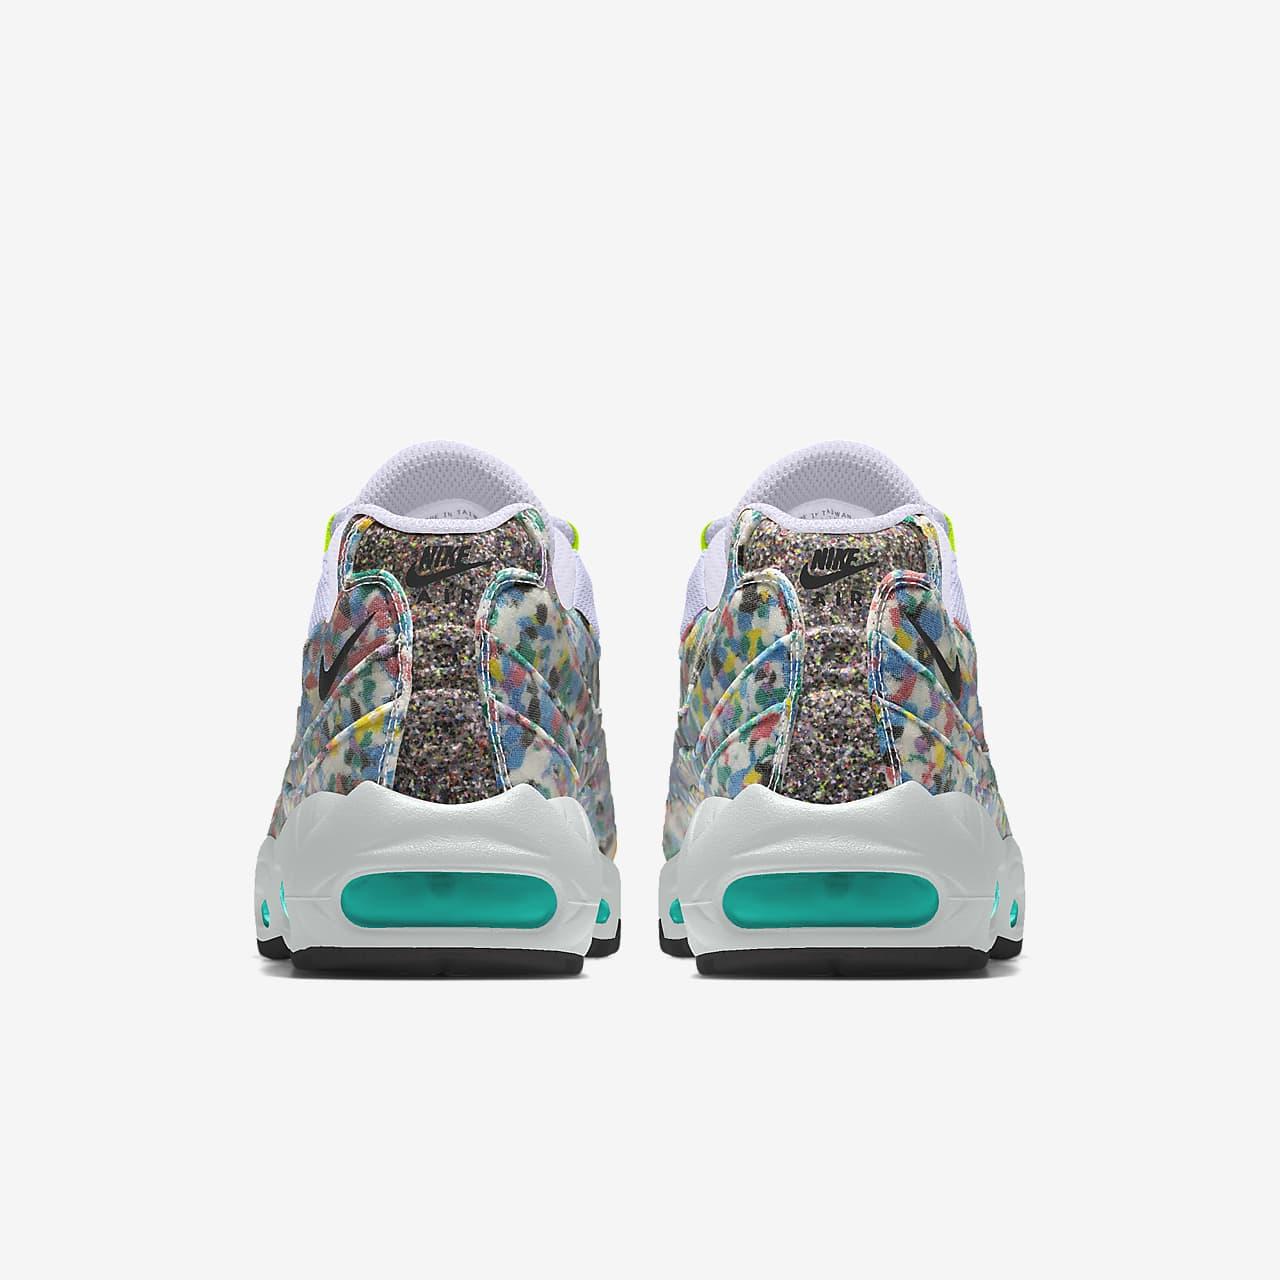 Nike Air Max 95 Unlocked By You Custom Men's Lifestyle Shoe